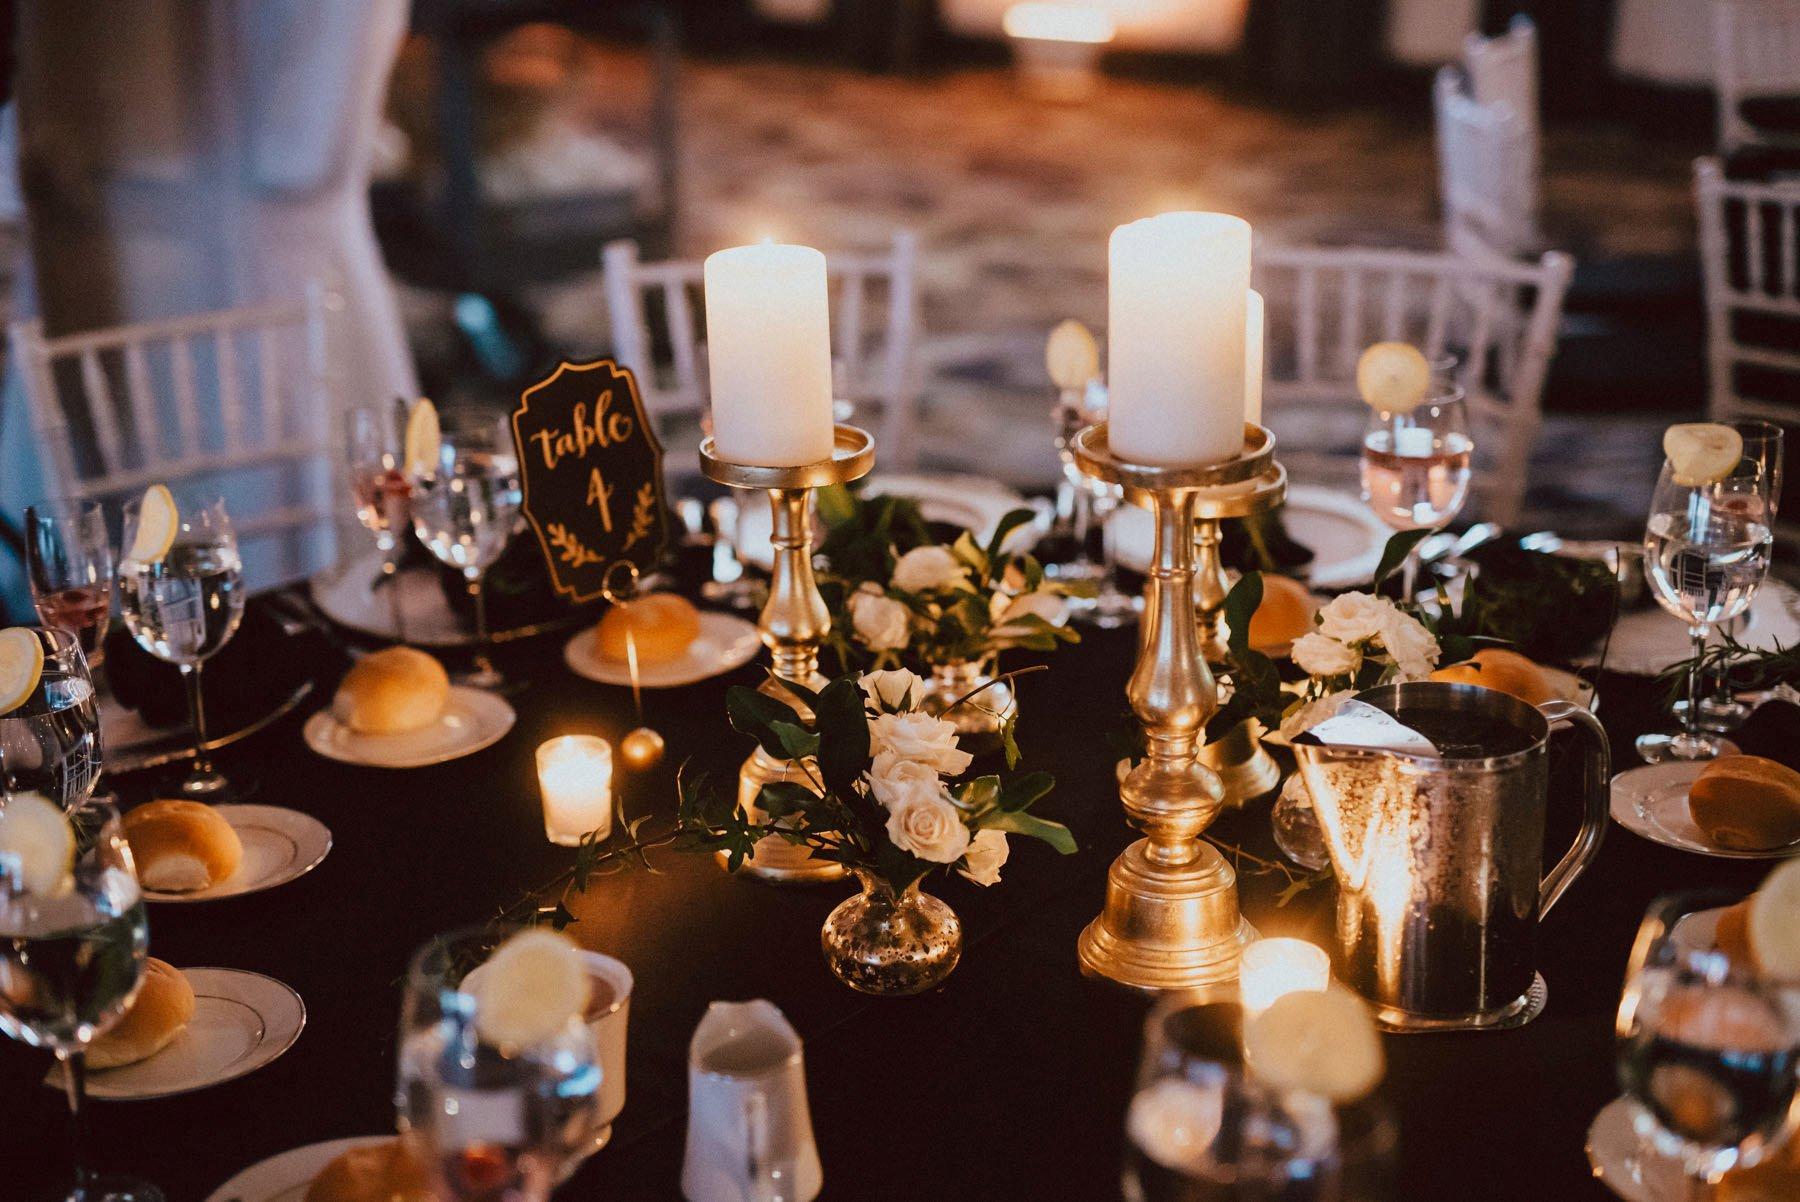 vie-philadelphia-indian-wedding-98.jpg